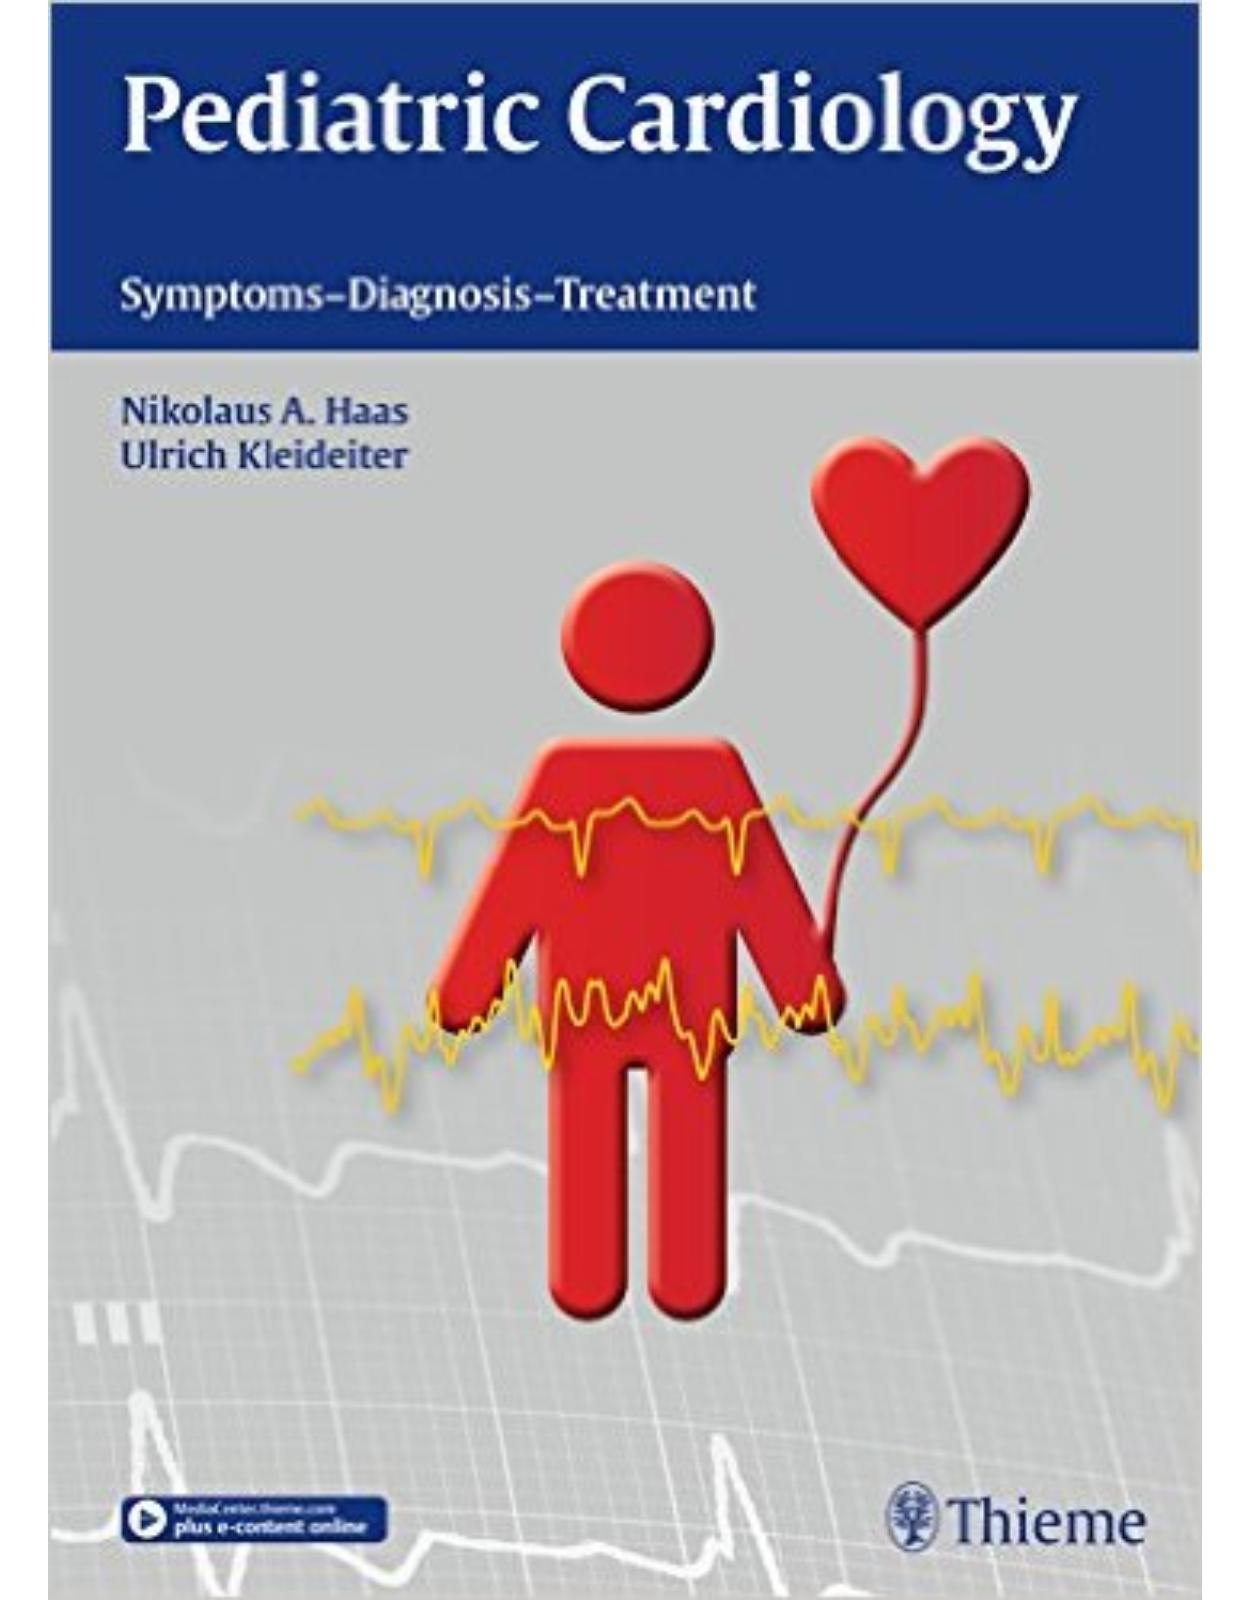 Pediatric Cardiology: Symptoms - Diagnosis - Treatment 1st Edition